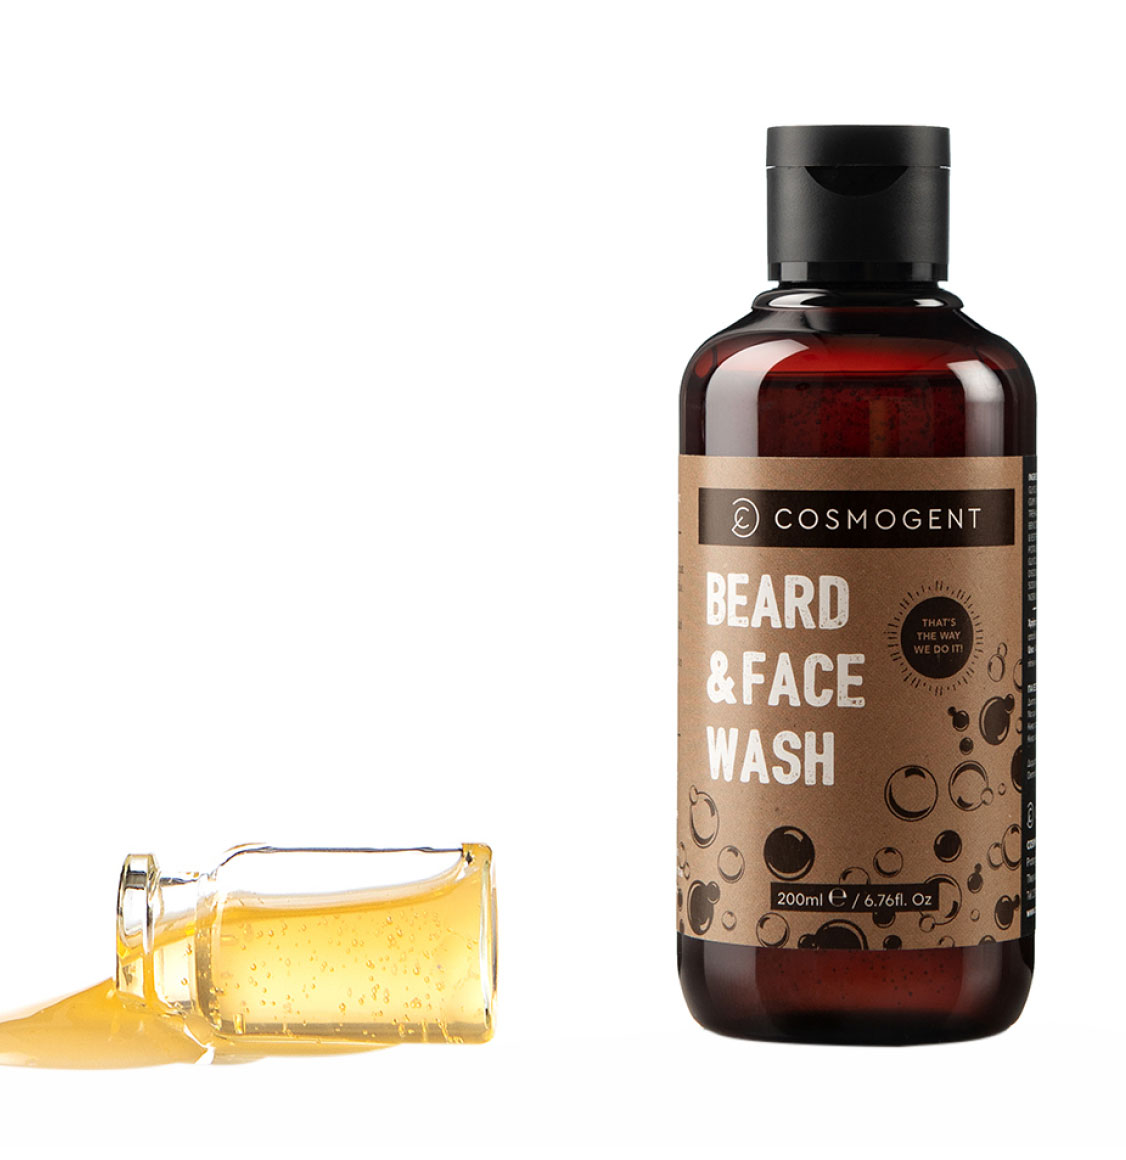 Cosmogent Σαμπουάν Γενειάδας Beard And Face Wash 200ml